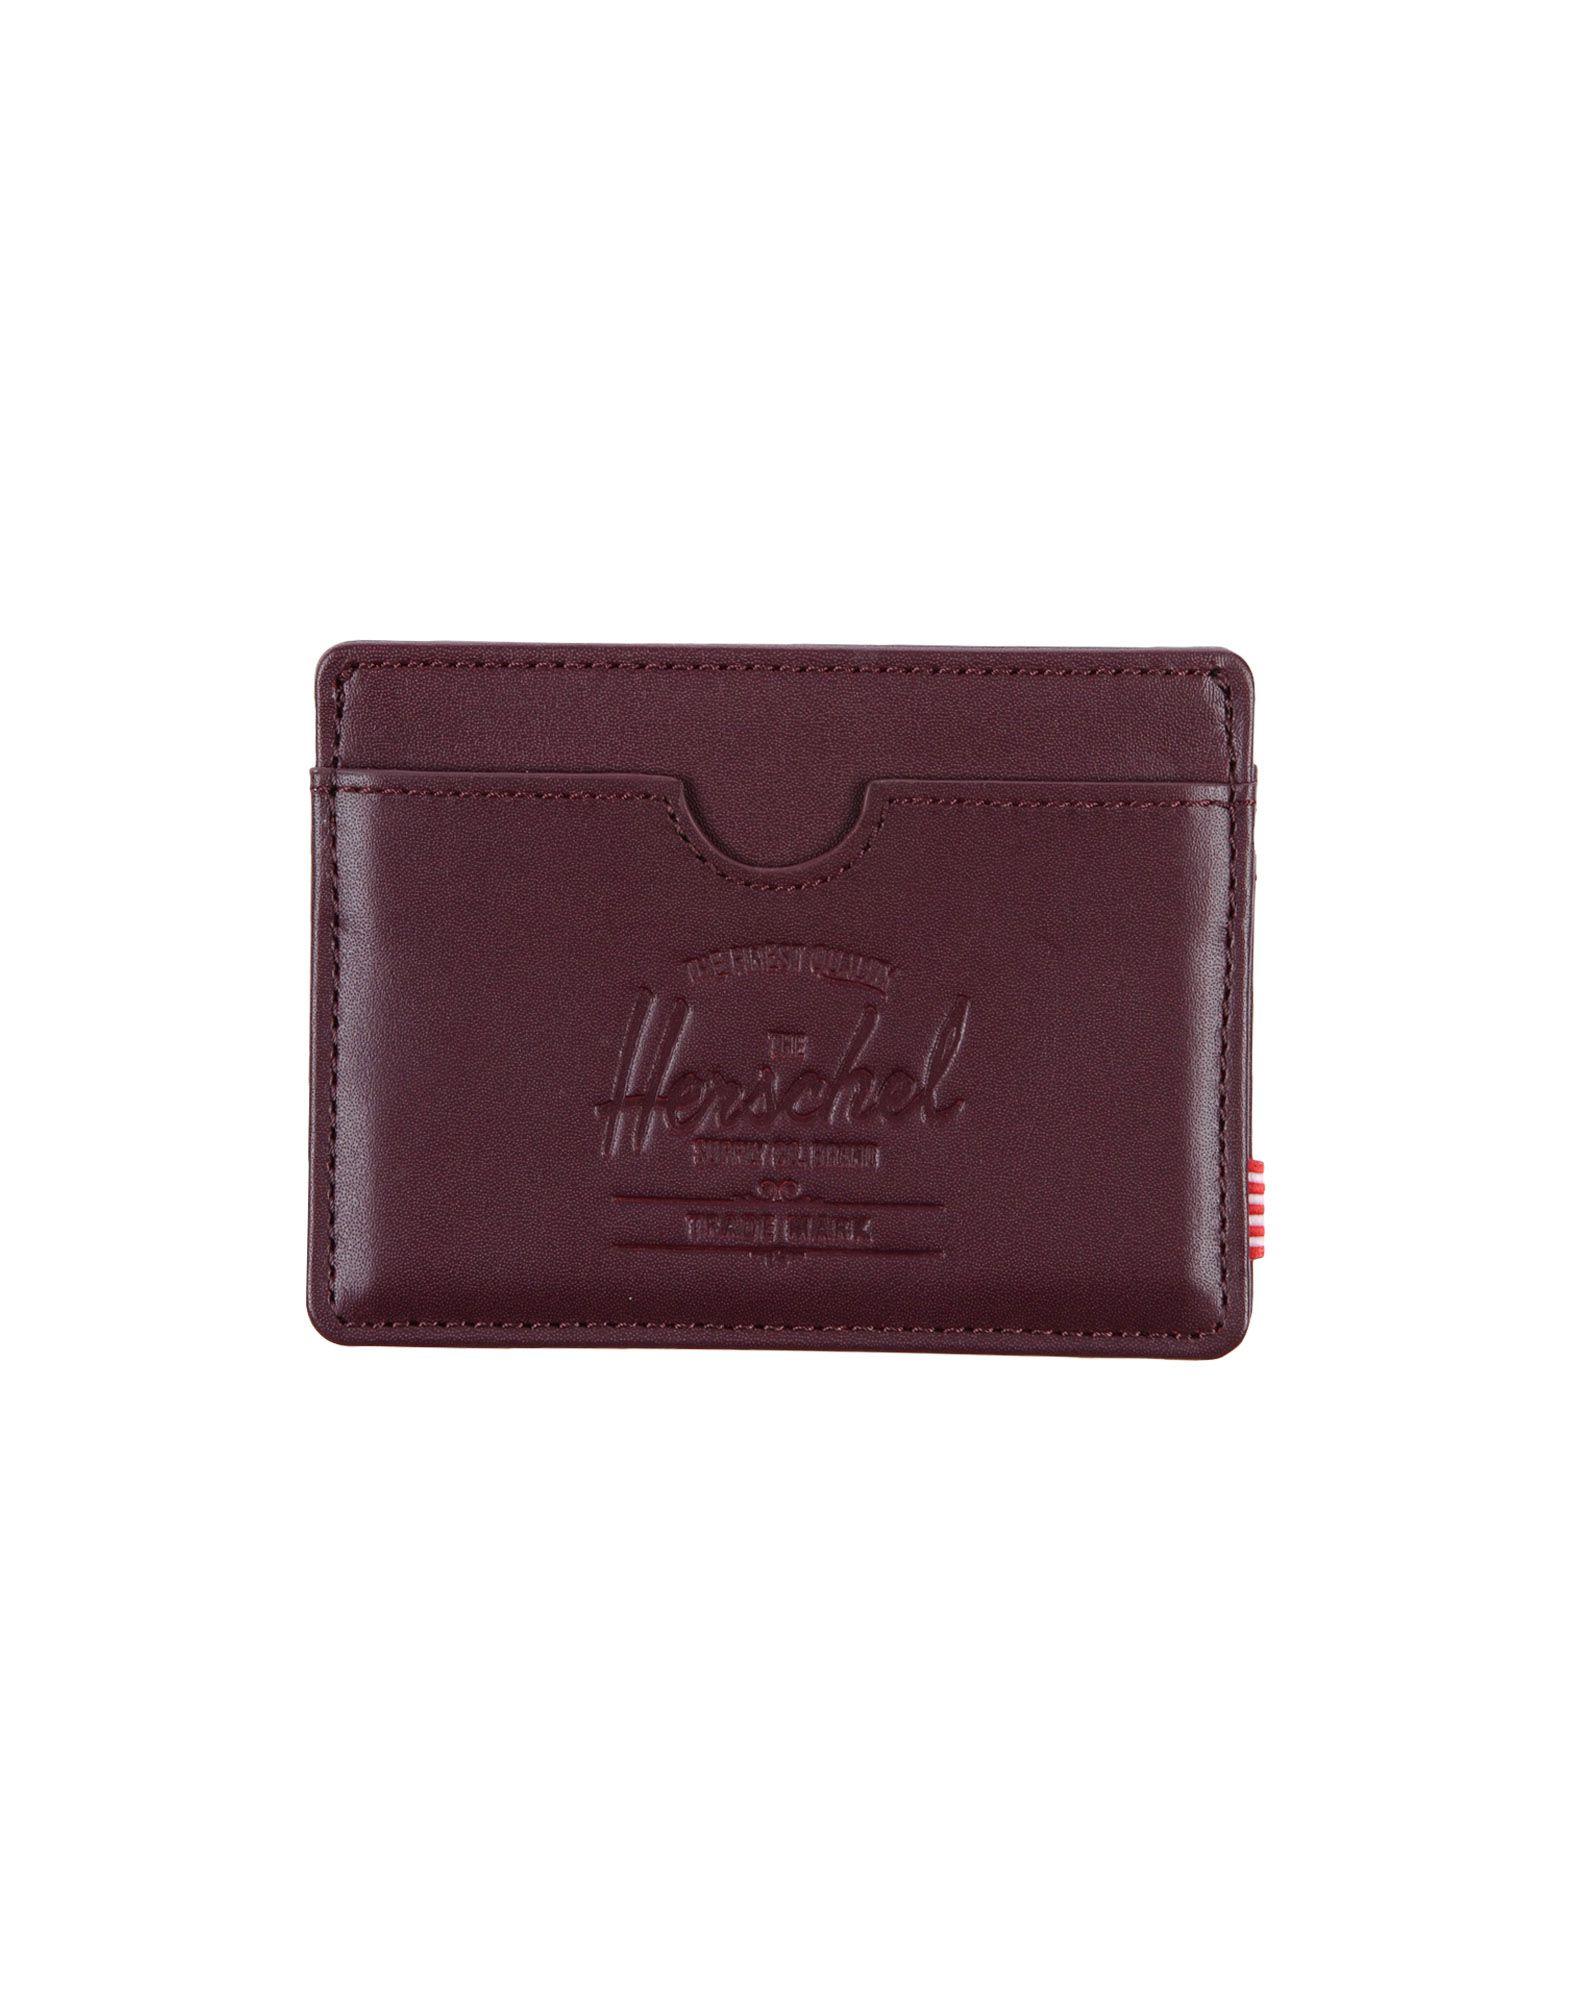 HERSCHEL SUPPLY CO. Чехол для документов рюкзак herschel supply co herschel supply co he013bwwjp97